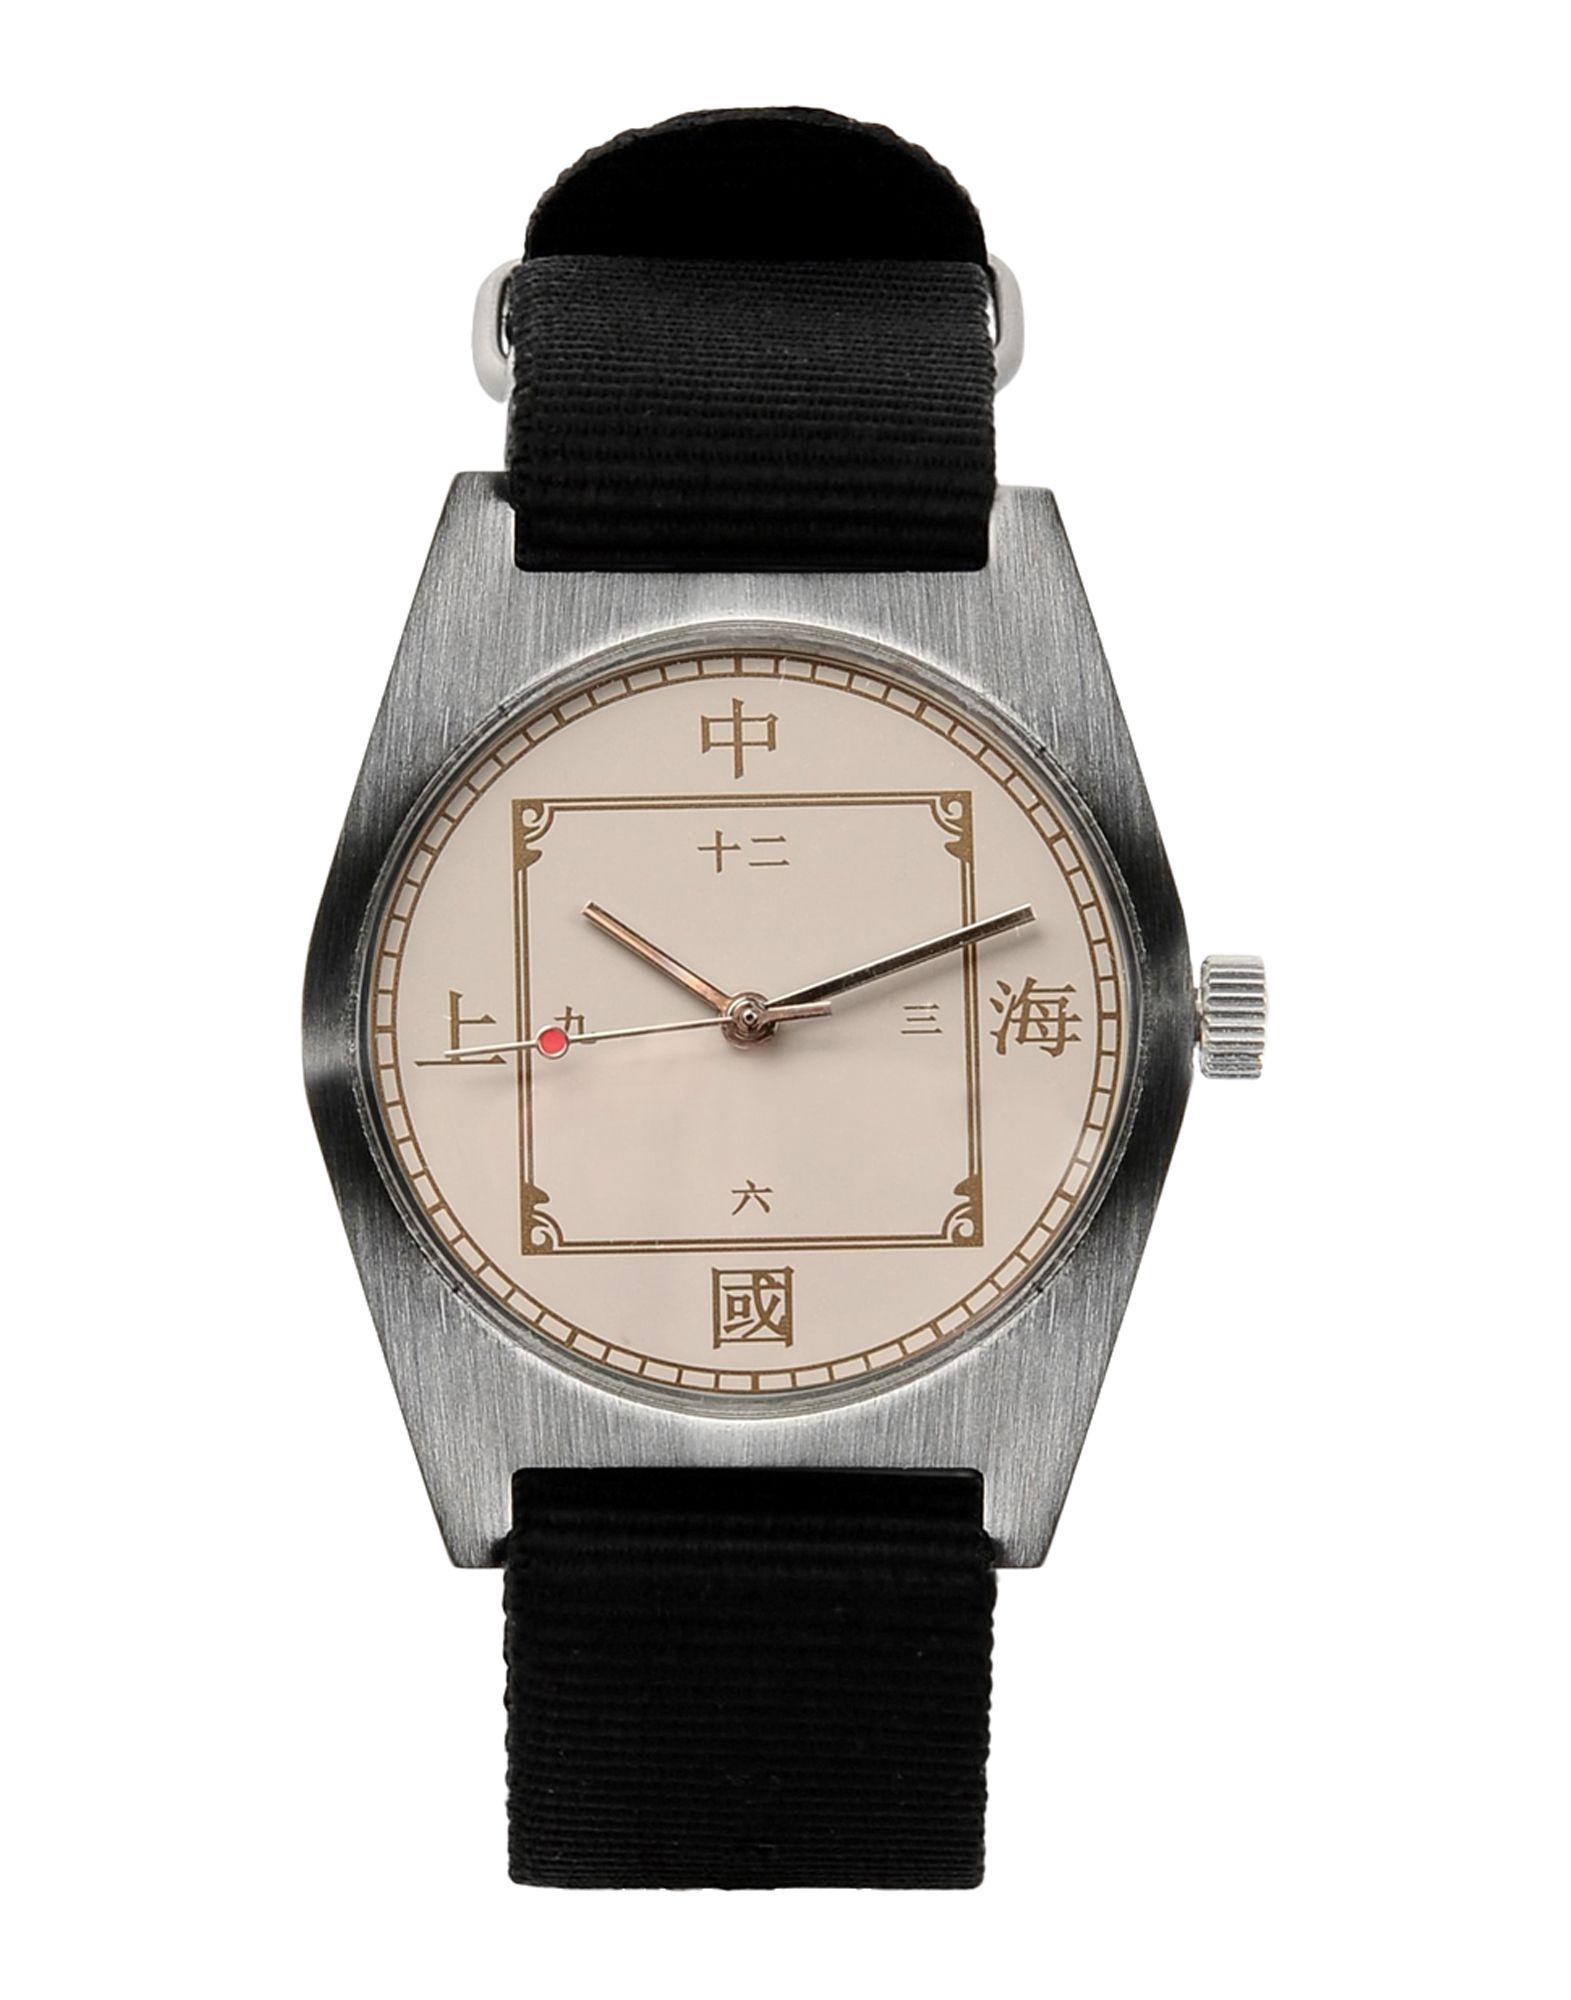 SHW SHANGHAI HENGBAO WATCH Наручные часы термометр shanghai 02